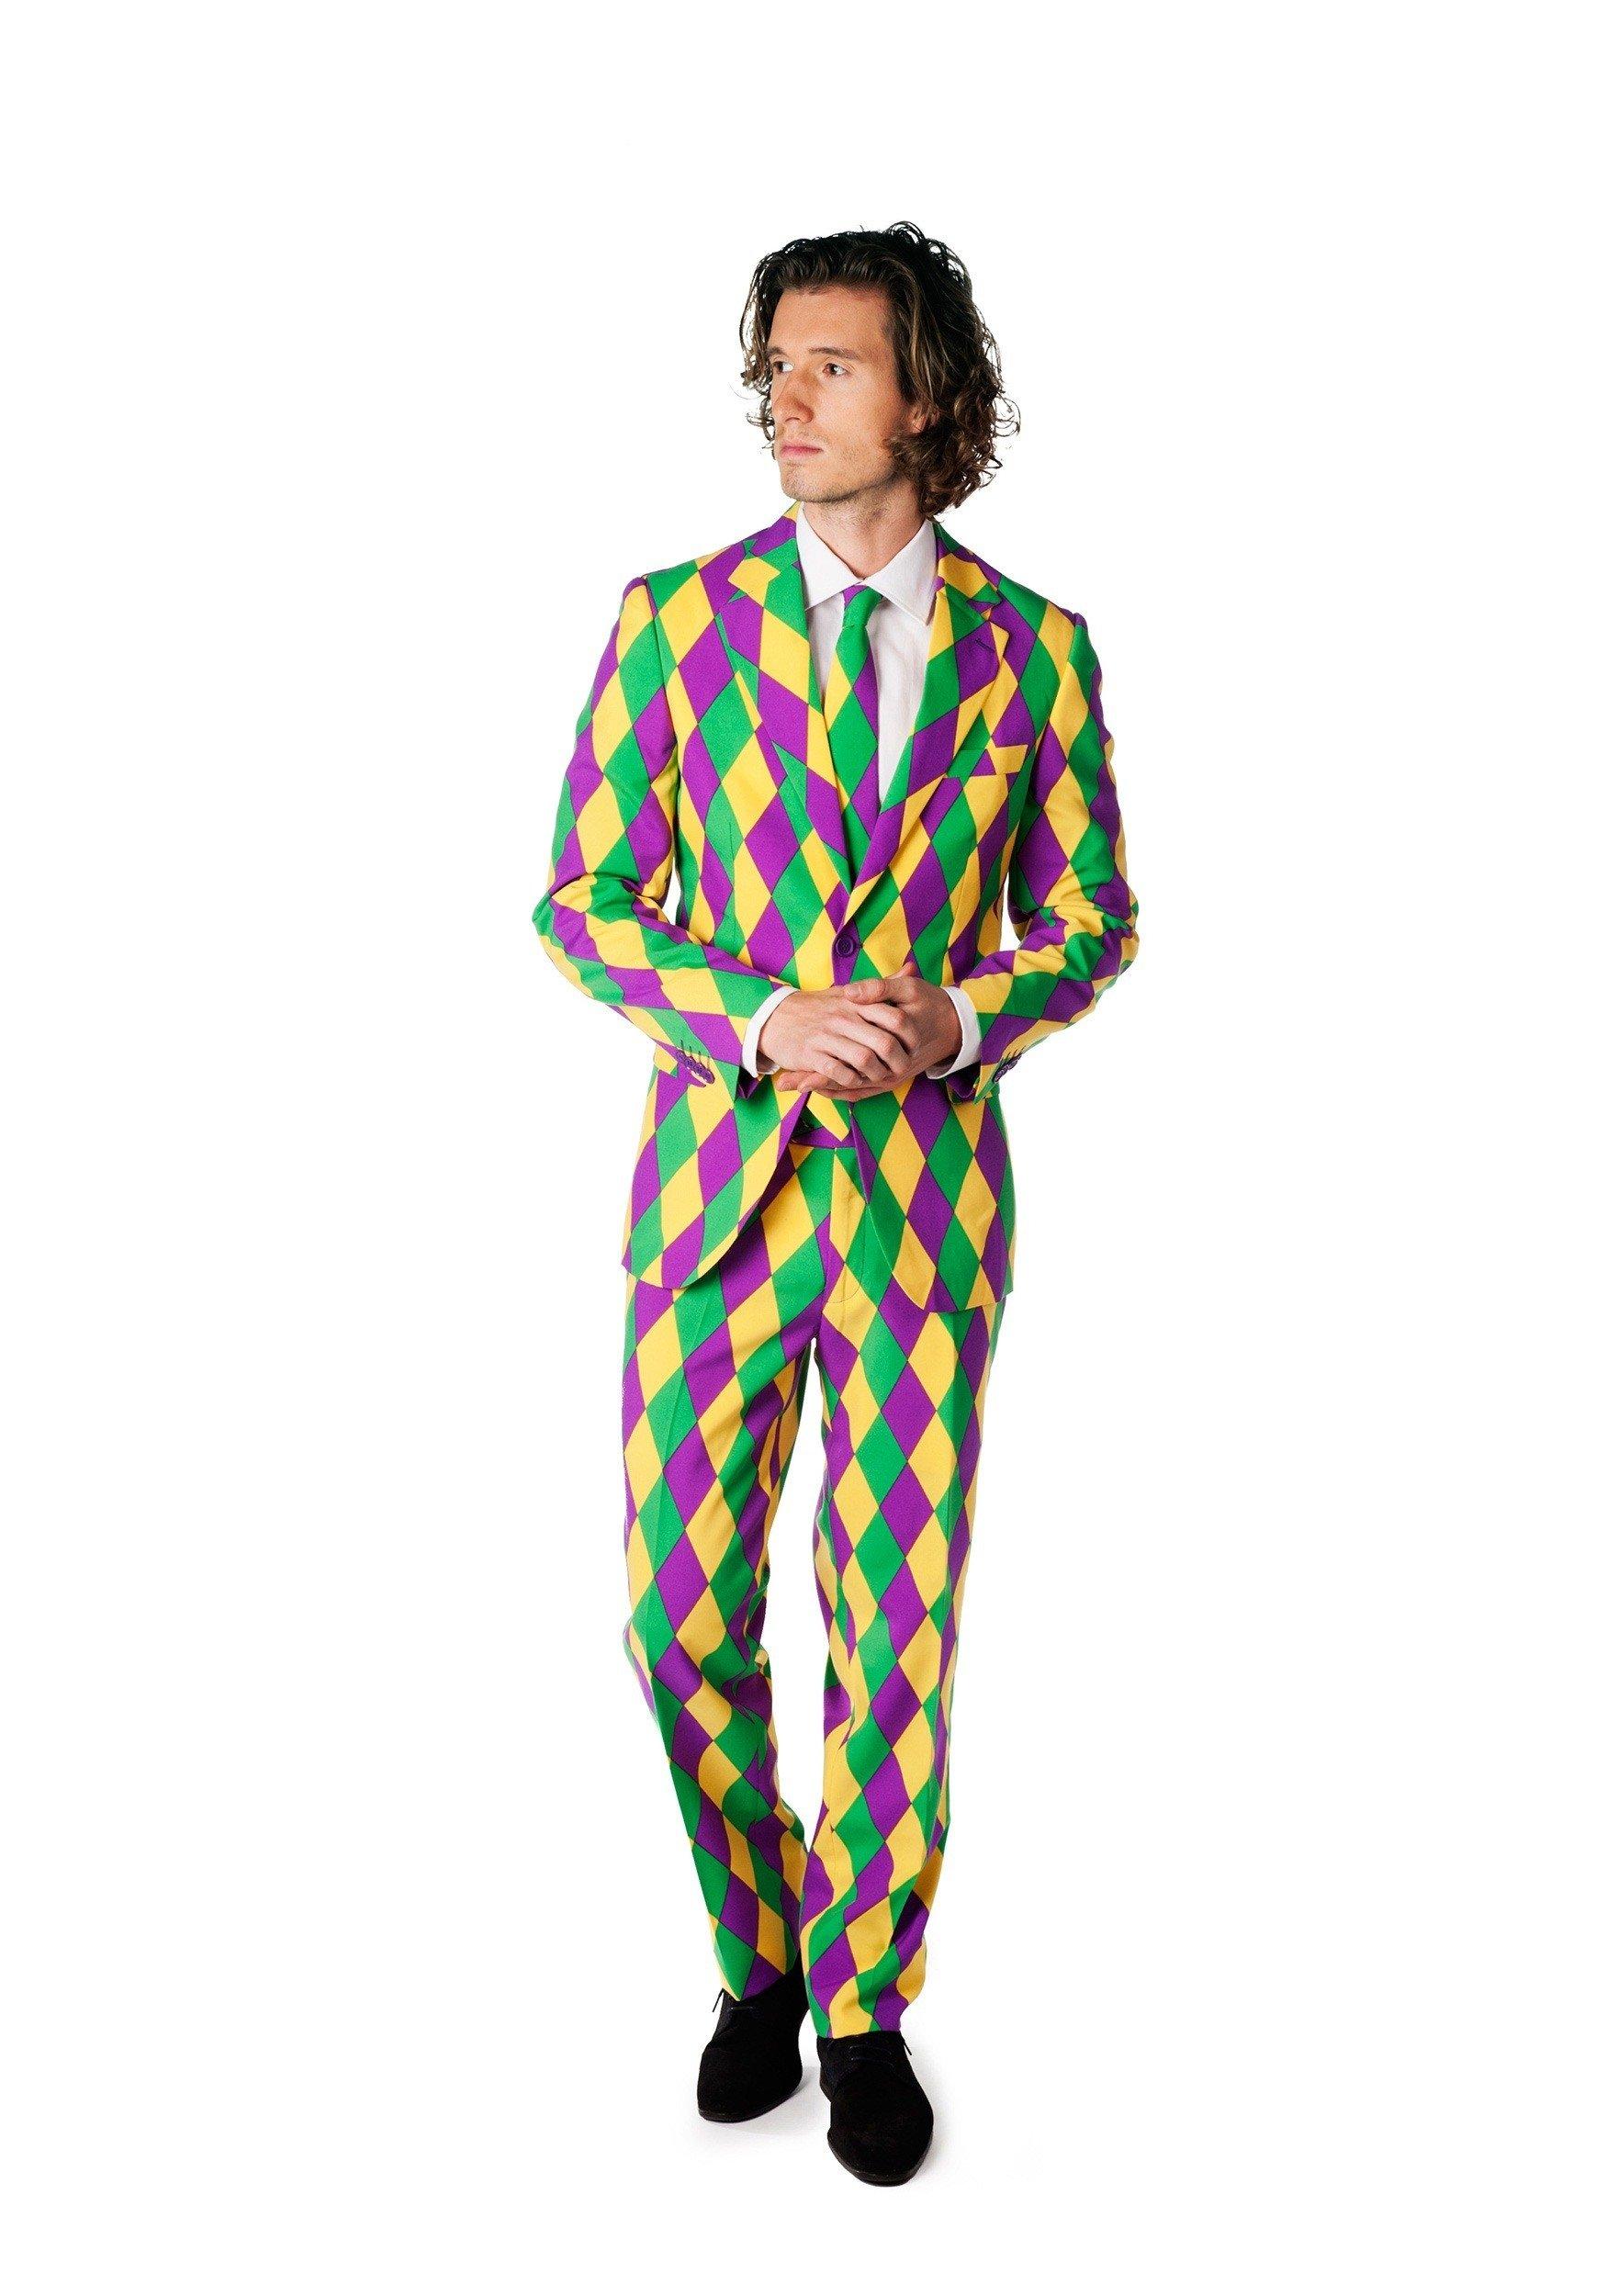 10 Great Mardi Gras Party Outfit Ideas mens opposuits mardi gras suit 2020